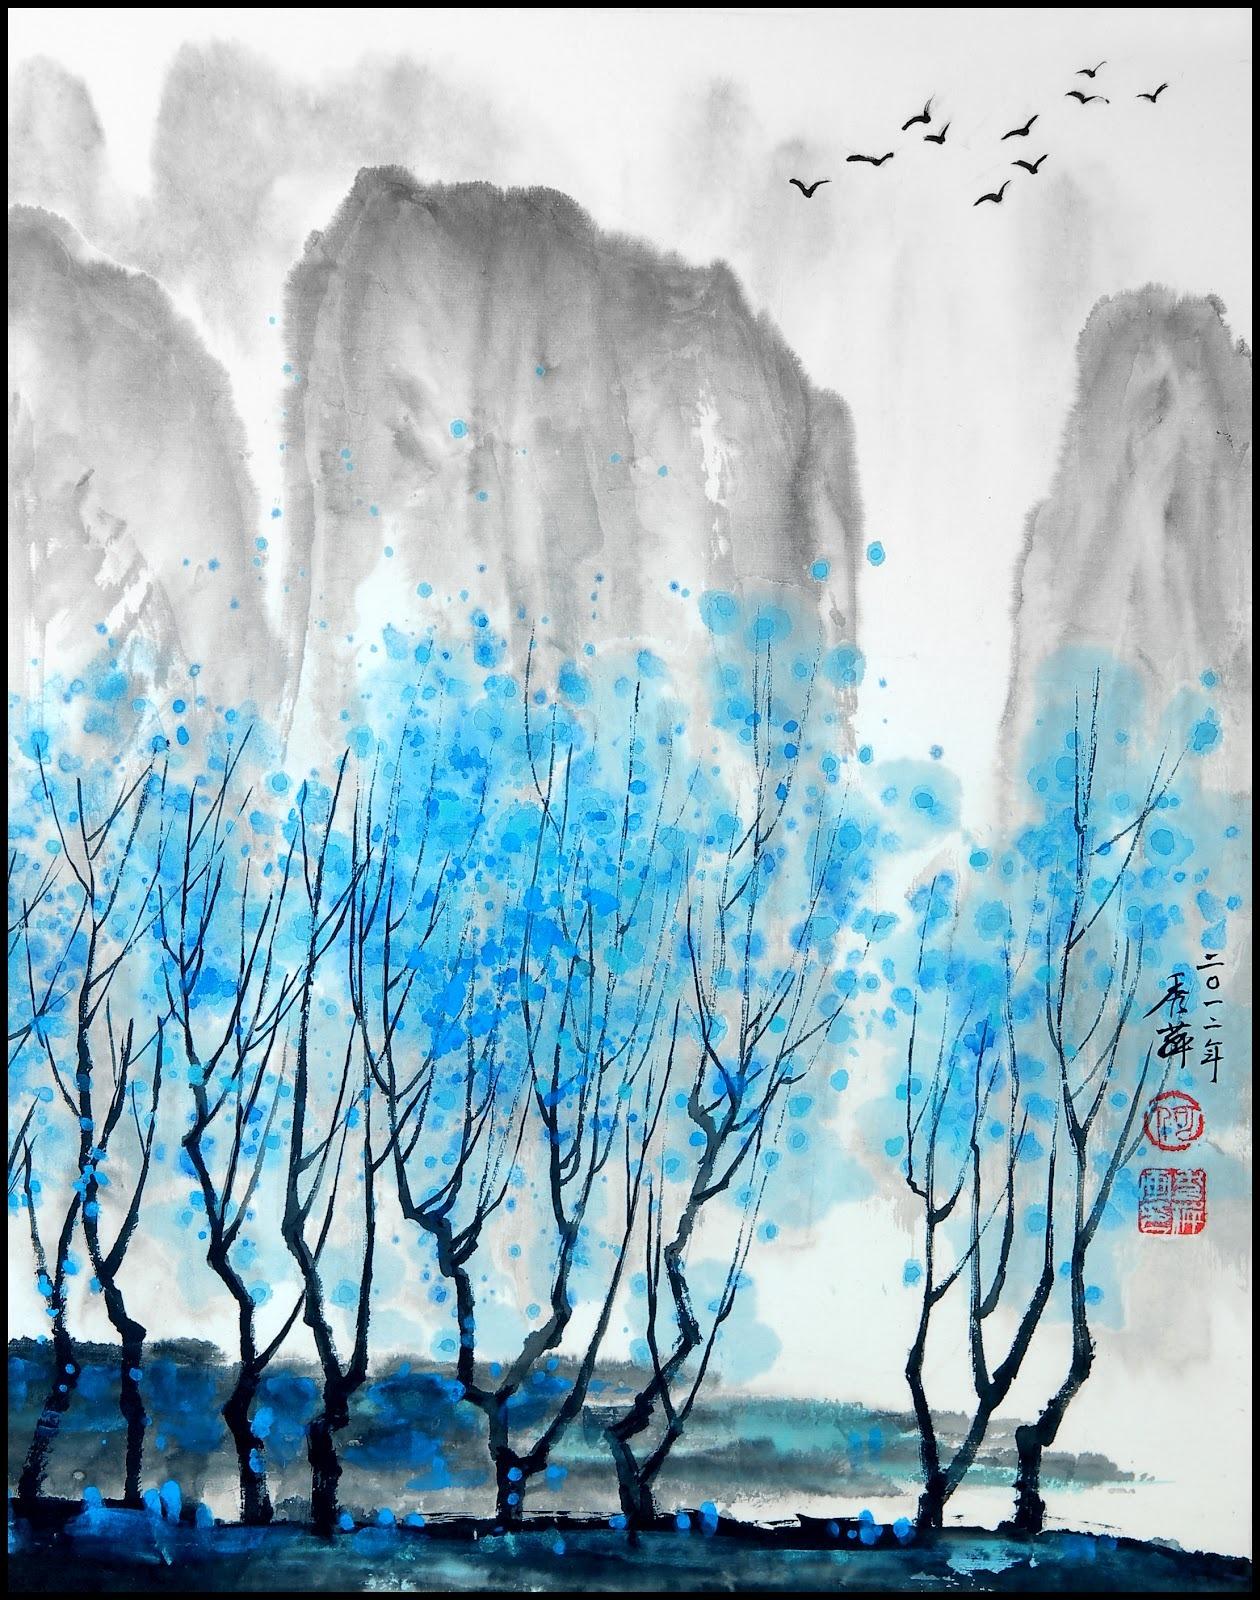 Artisansoul_4 Spring in Lijiang.jpg